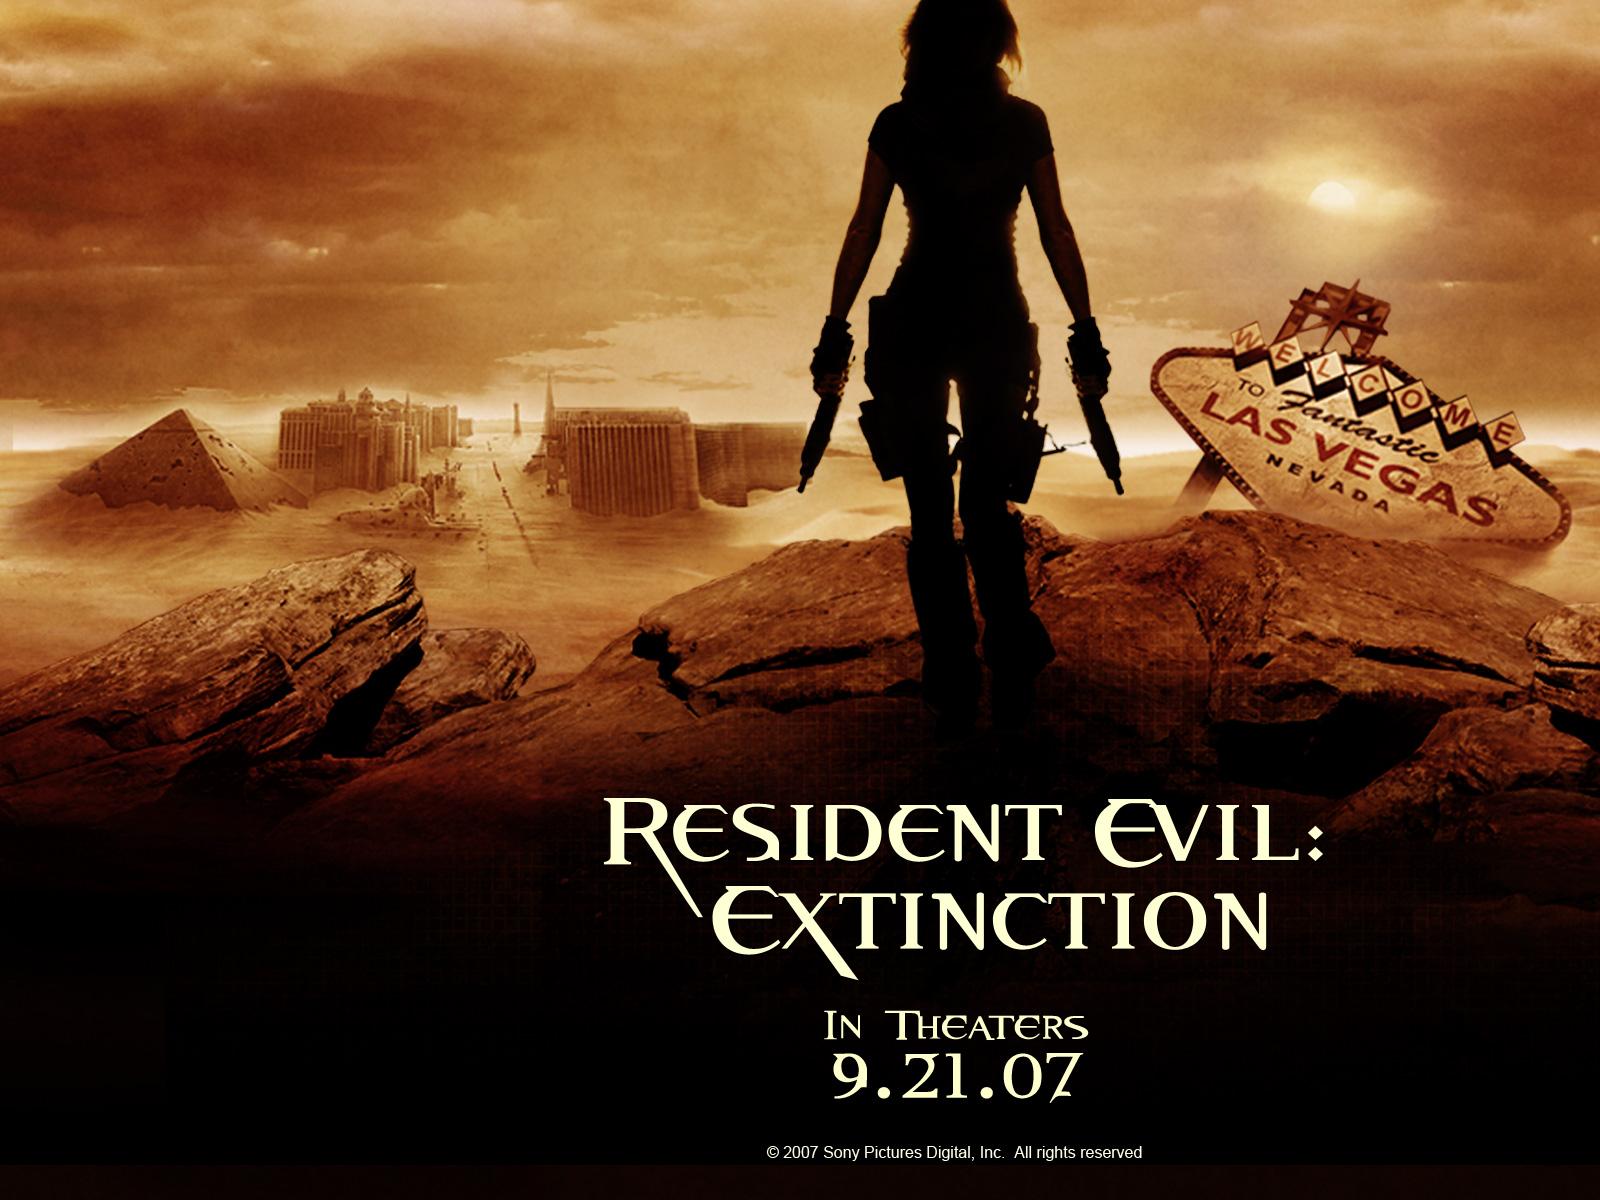 http://2.bp.blogspot.com/-kSbH_EUX9F4/UGdA_ykegWI/AAAAAAAACEI/sG_TqVJ7V-A/s1600/Resident-Evil-Extinction-resident-evil-338223_1600_1200.jpg